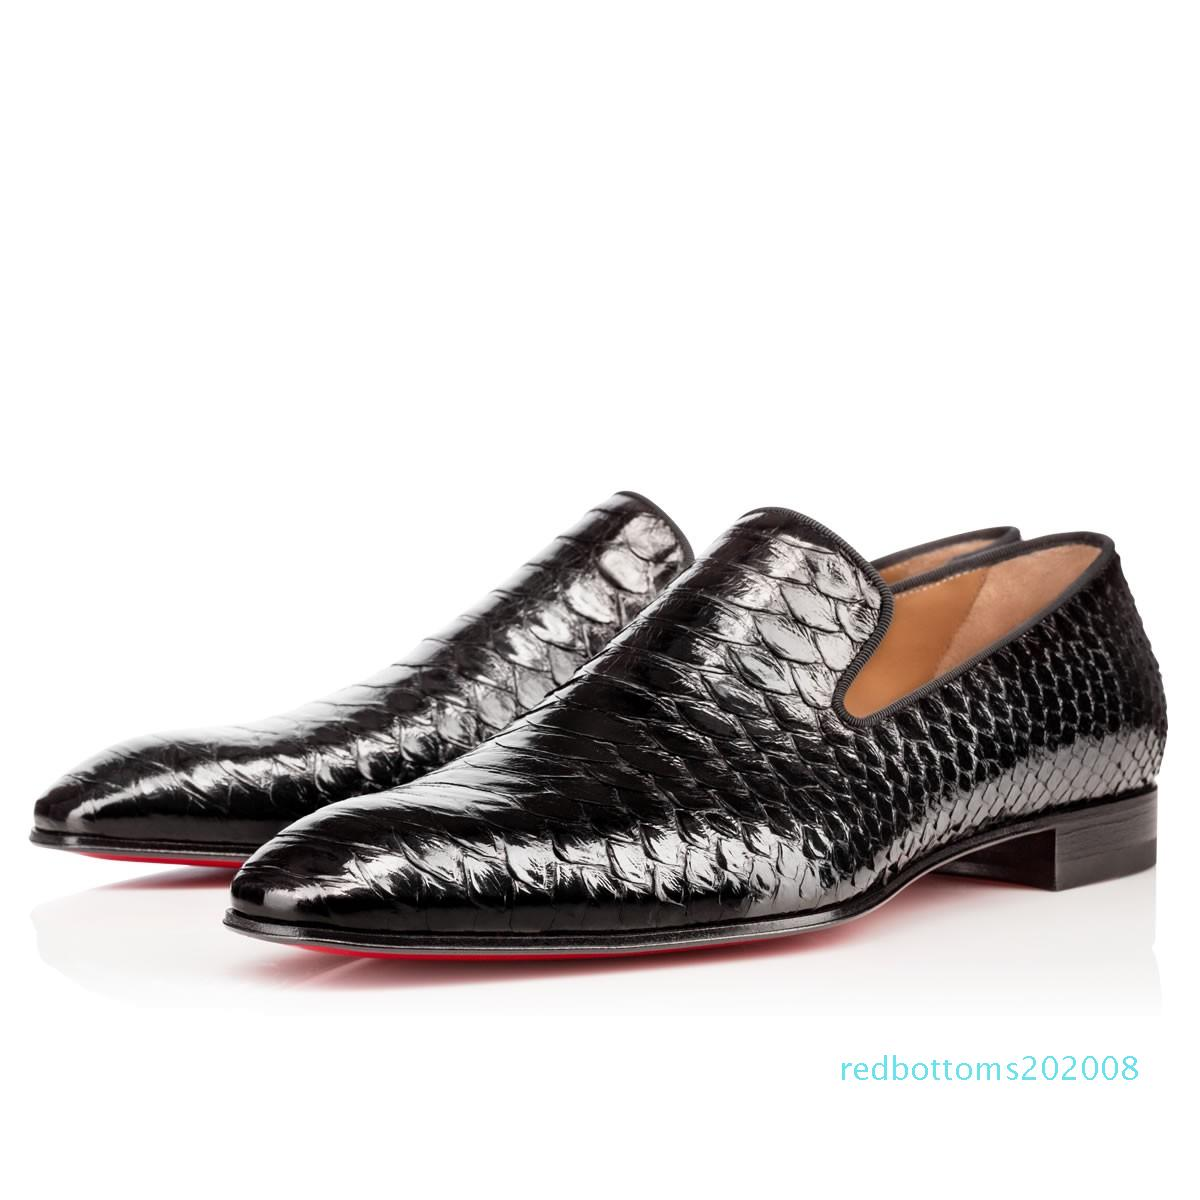 2019 Marque Rouge Bas Mocassins Luxury Wedding Party Chaussures Designer cuir verni noir Chaussures Robe Suede pour Slip Mens Flats R08